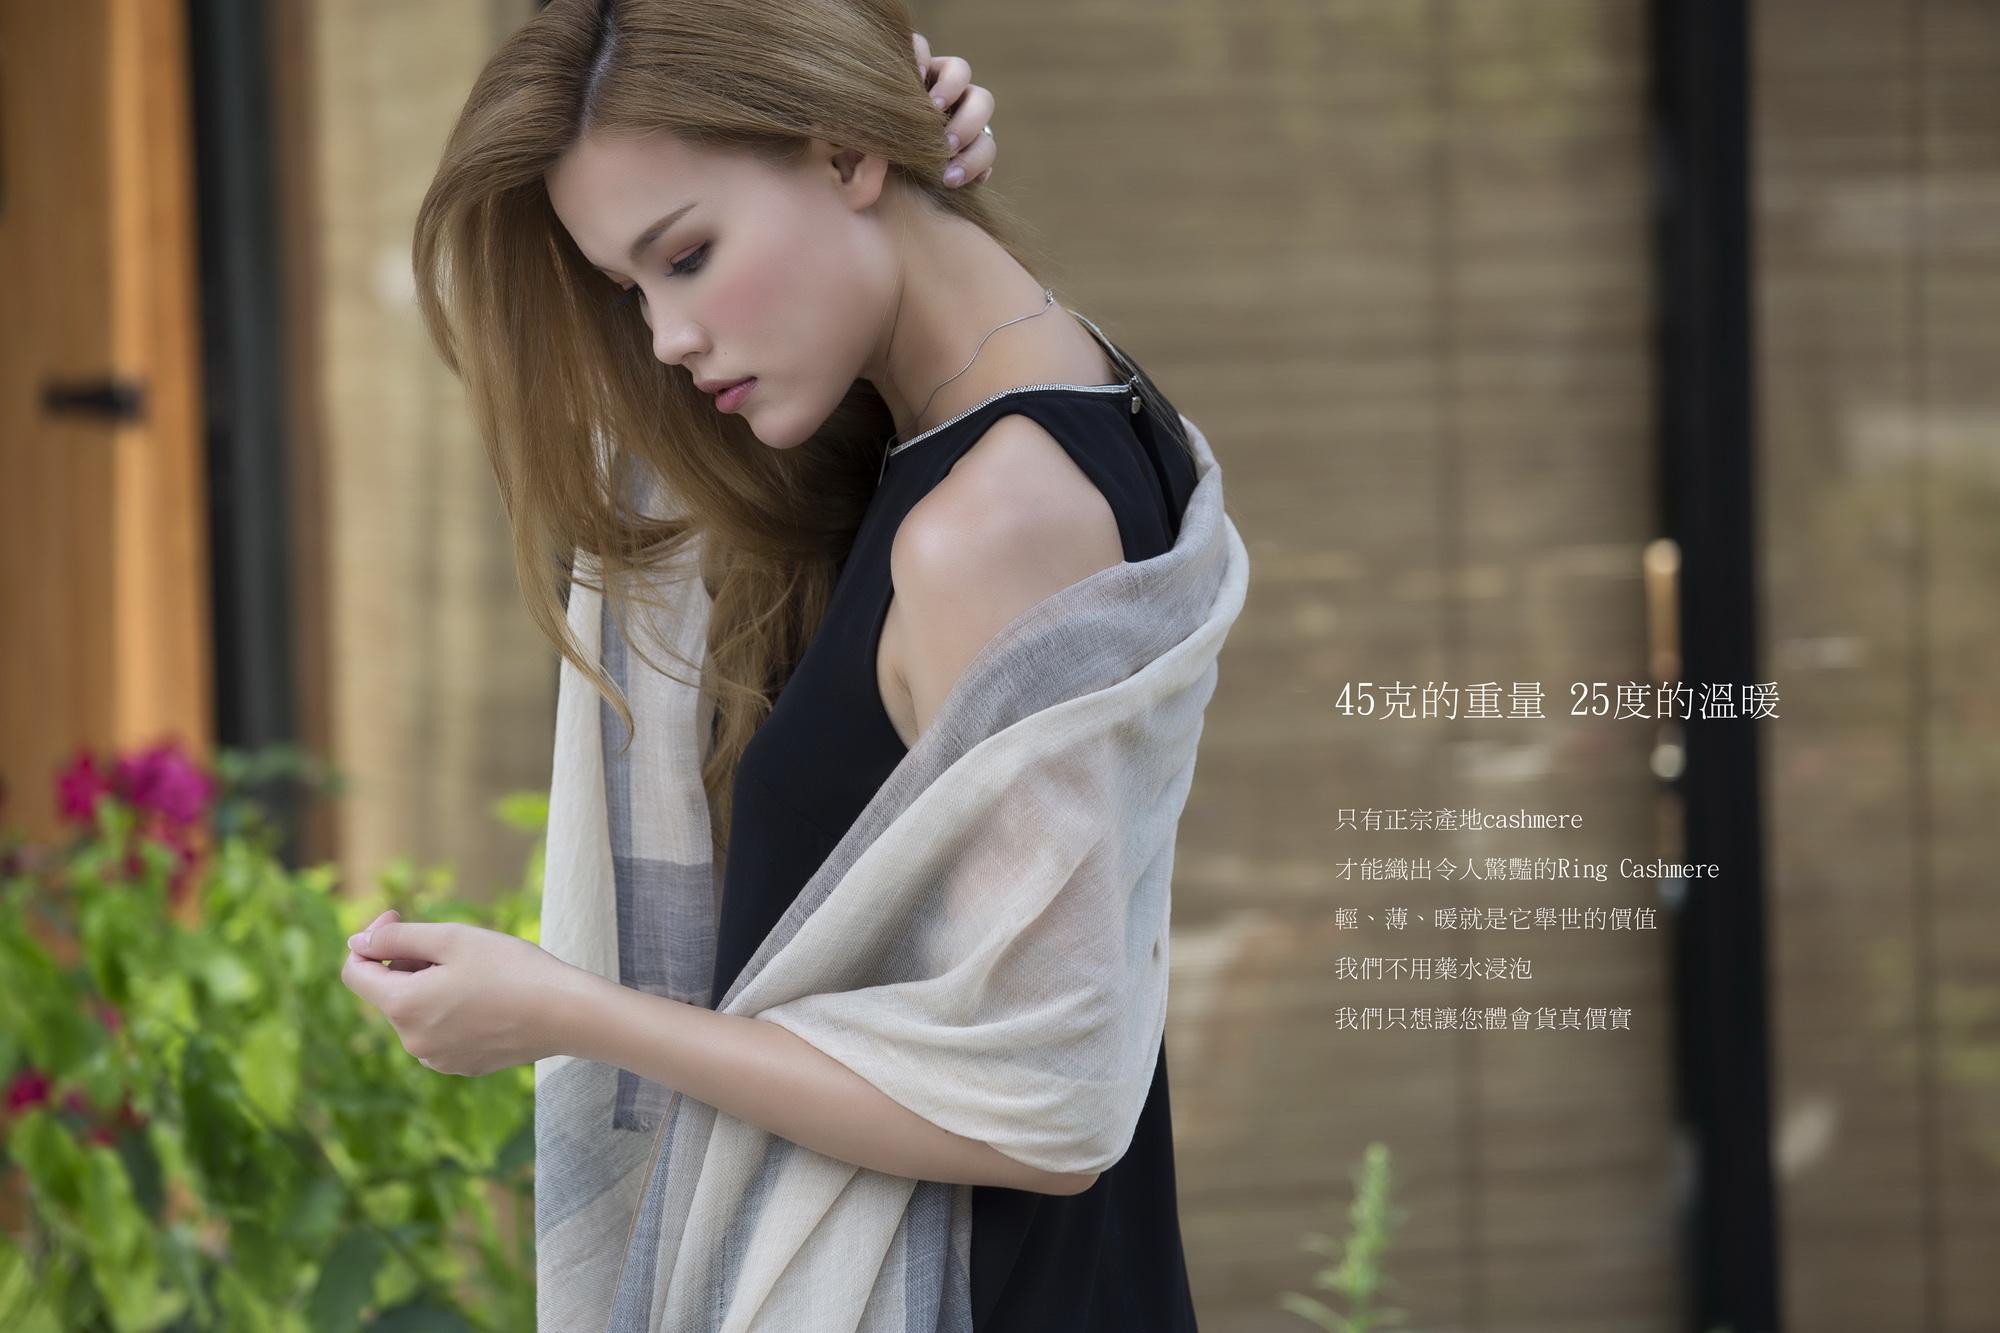 zentopia100%cashmere超薄穿戒圍巾